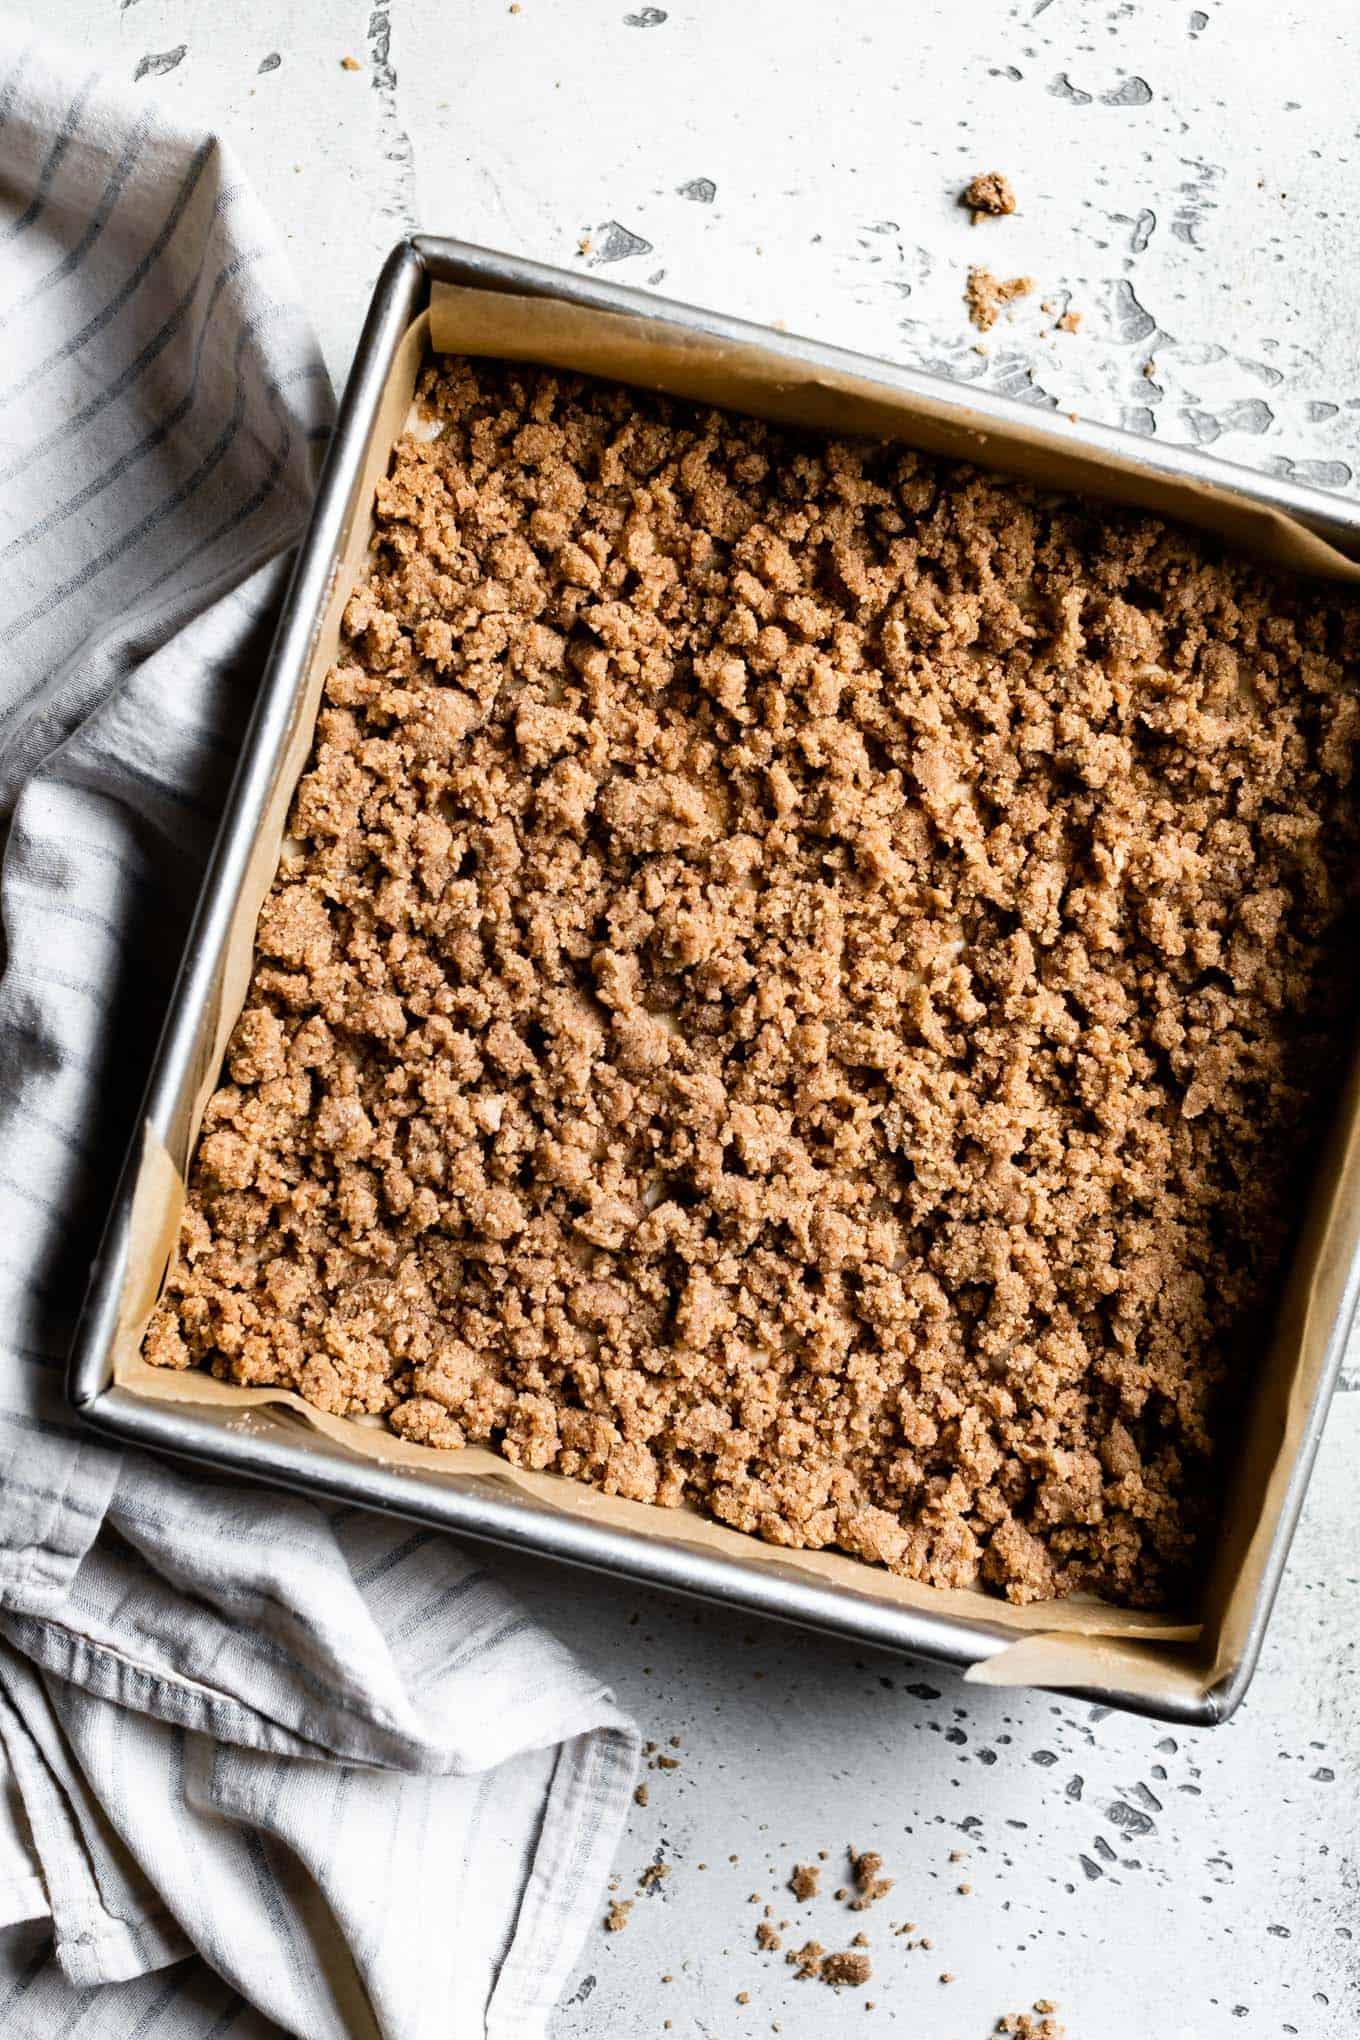 Cinnamon Streusel Gluten-Free Coffee Cake